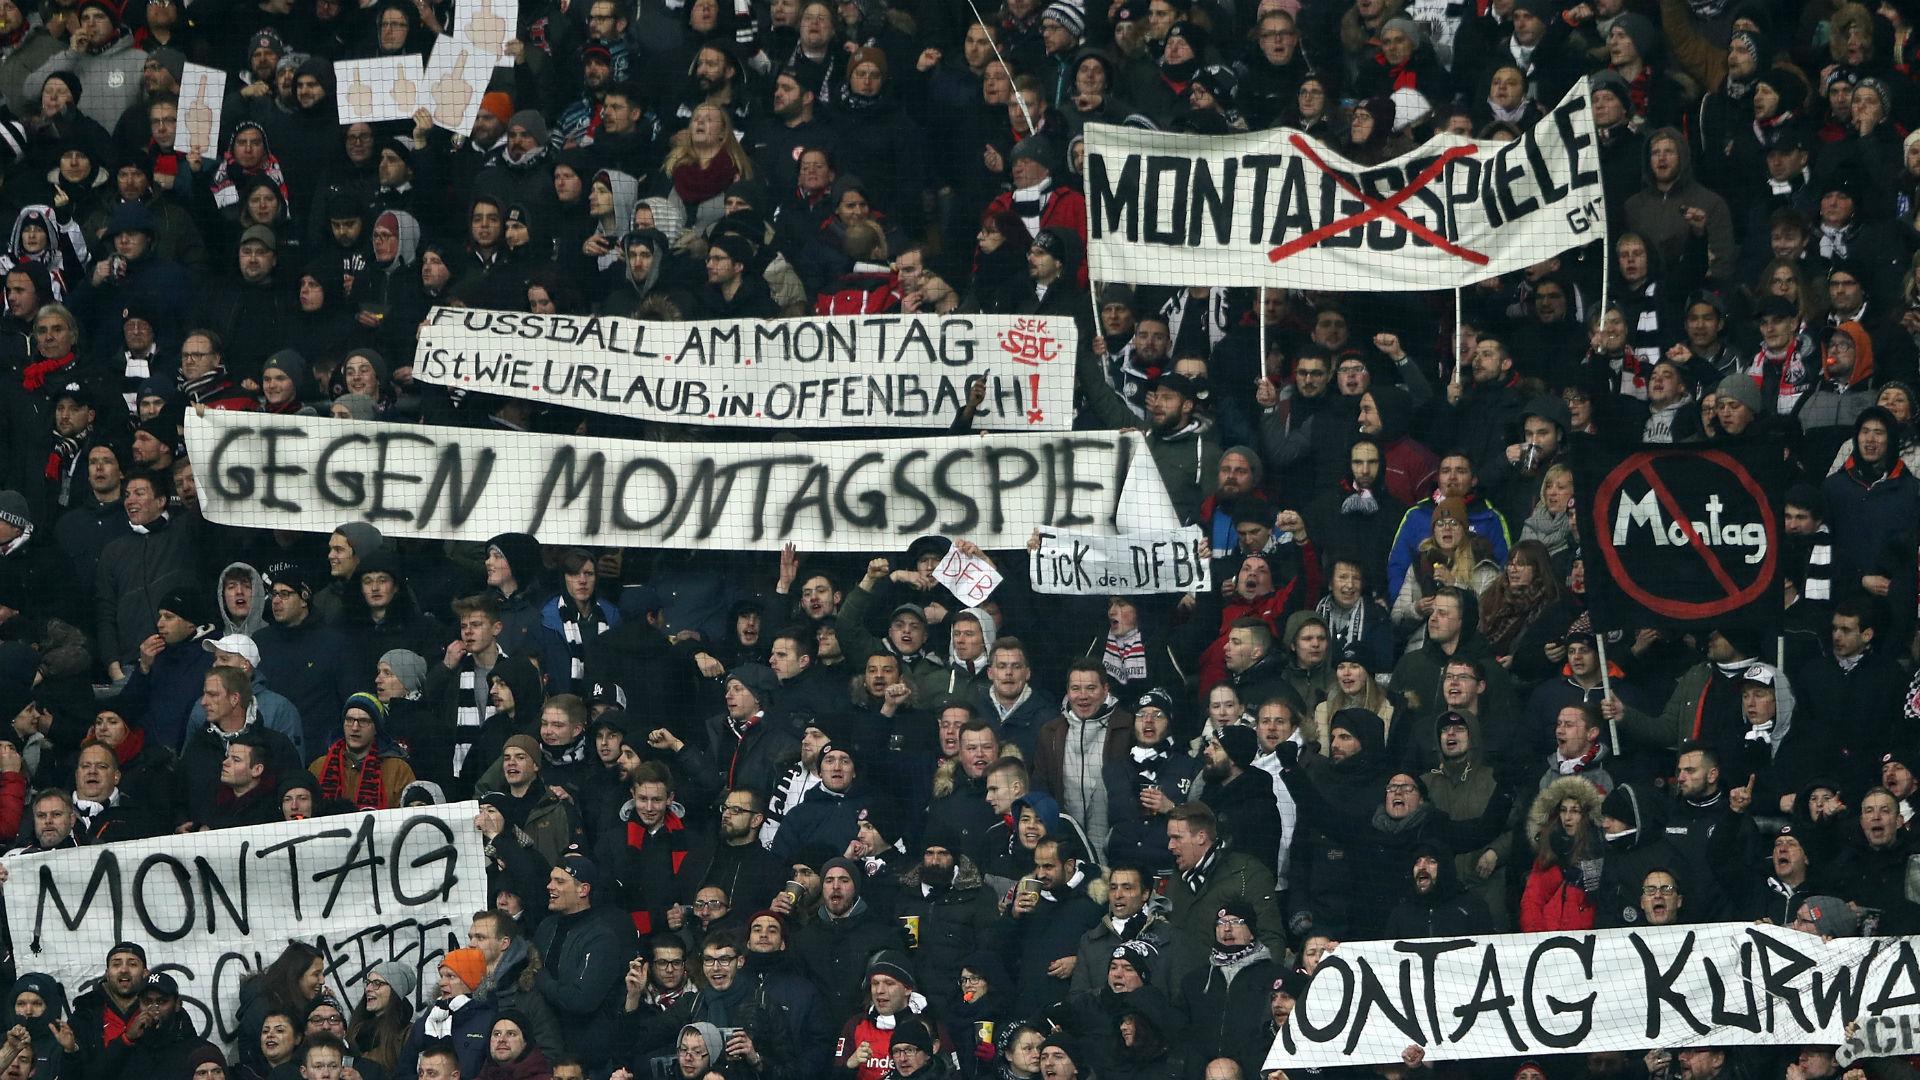 Frankfurt fans Gegen Montagsspiel protest